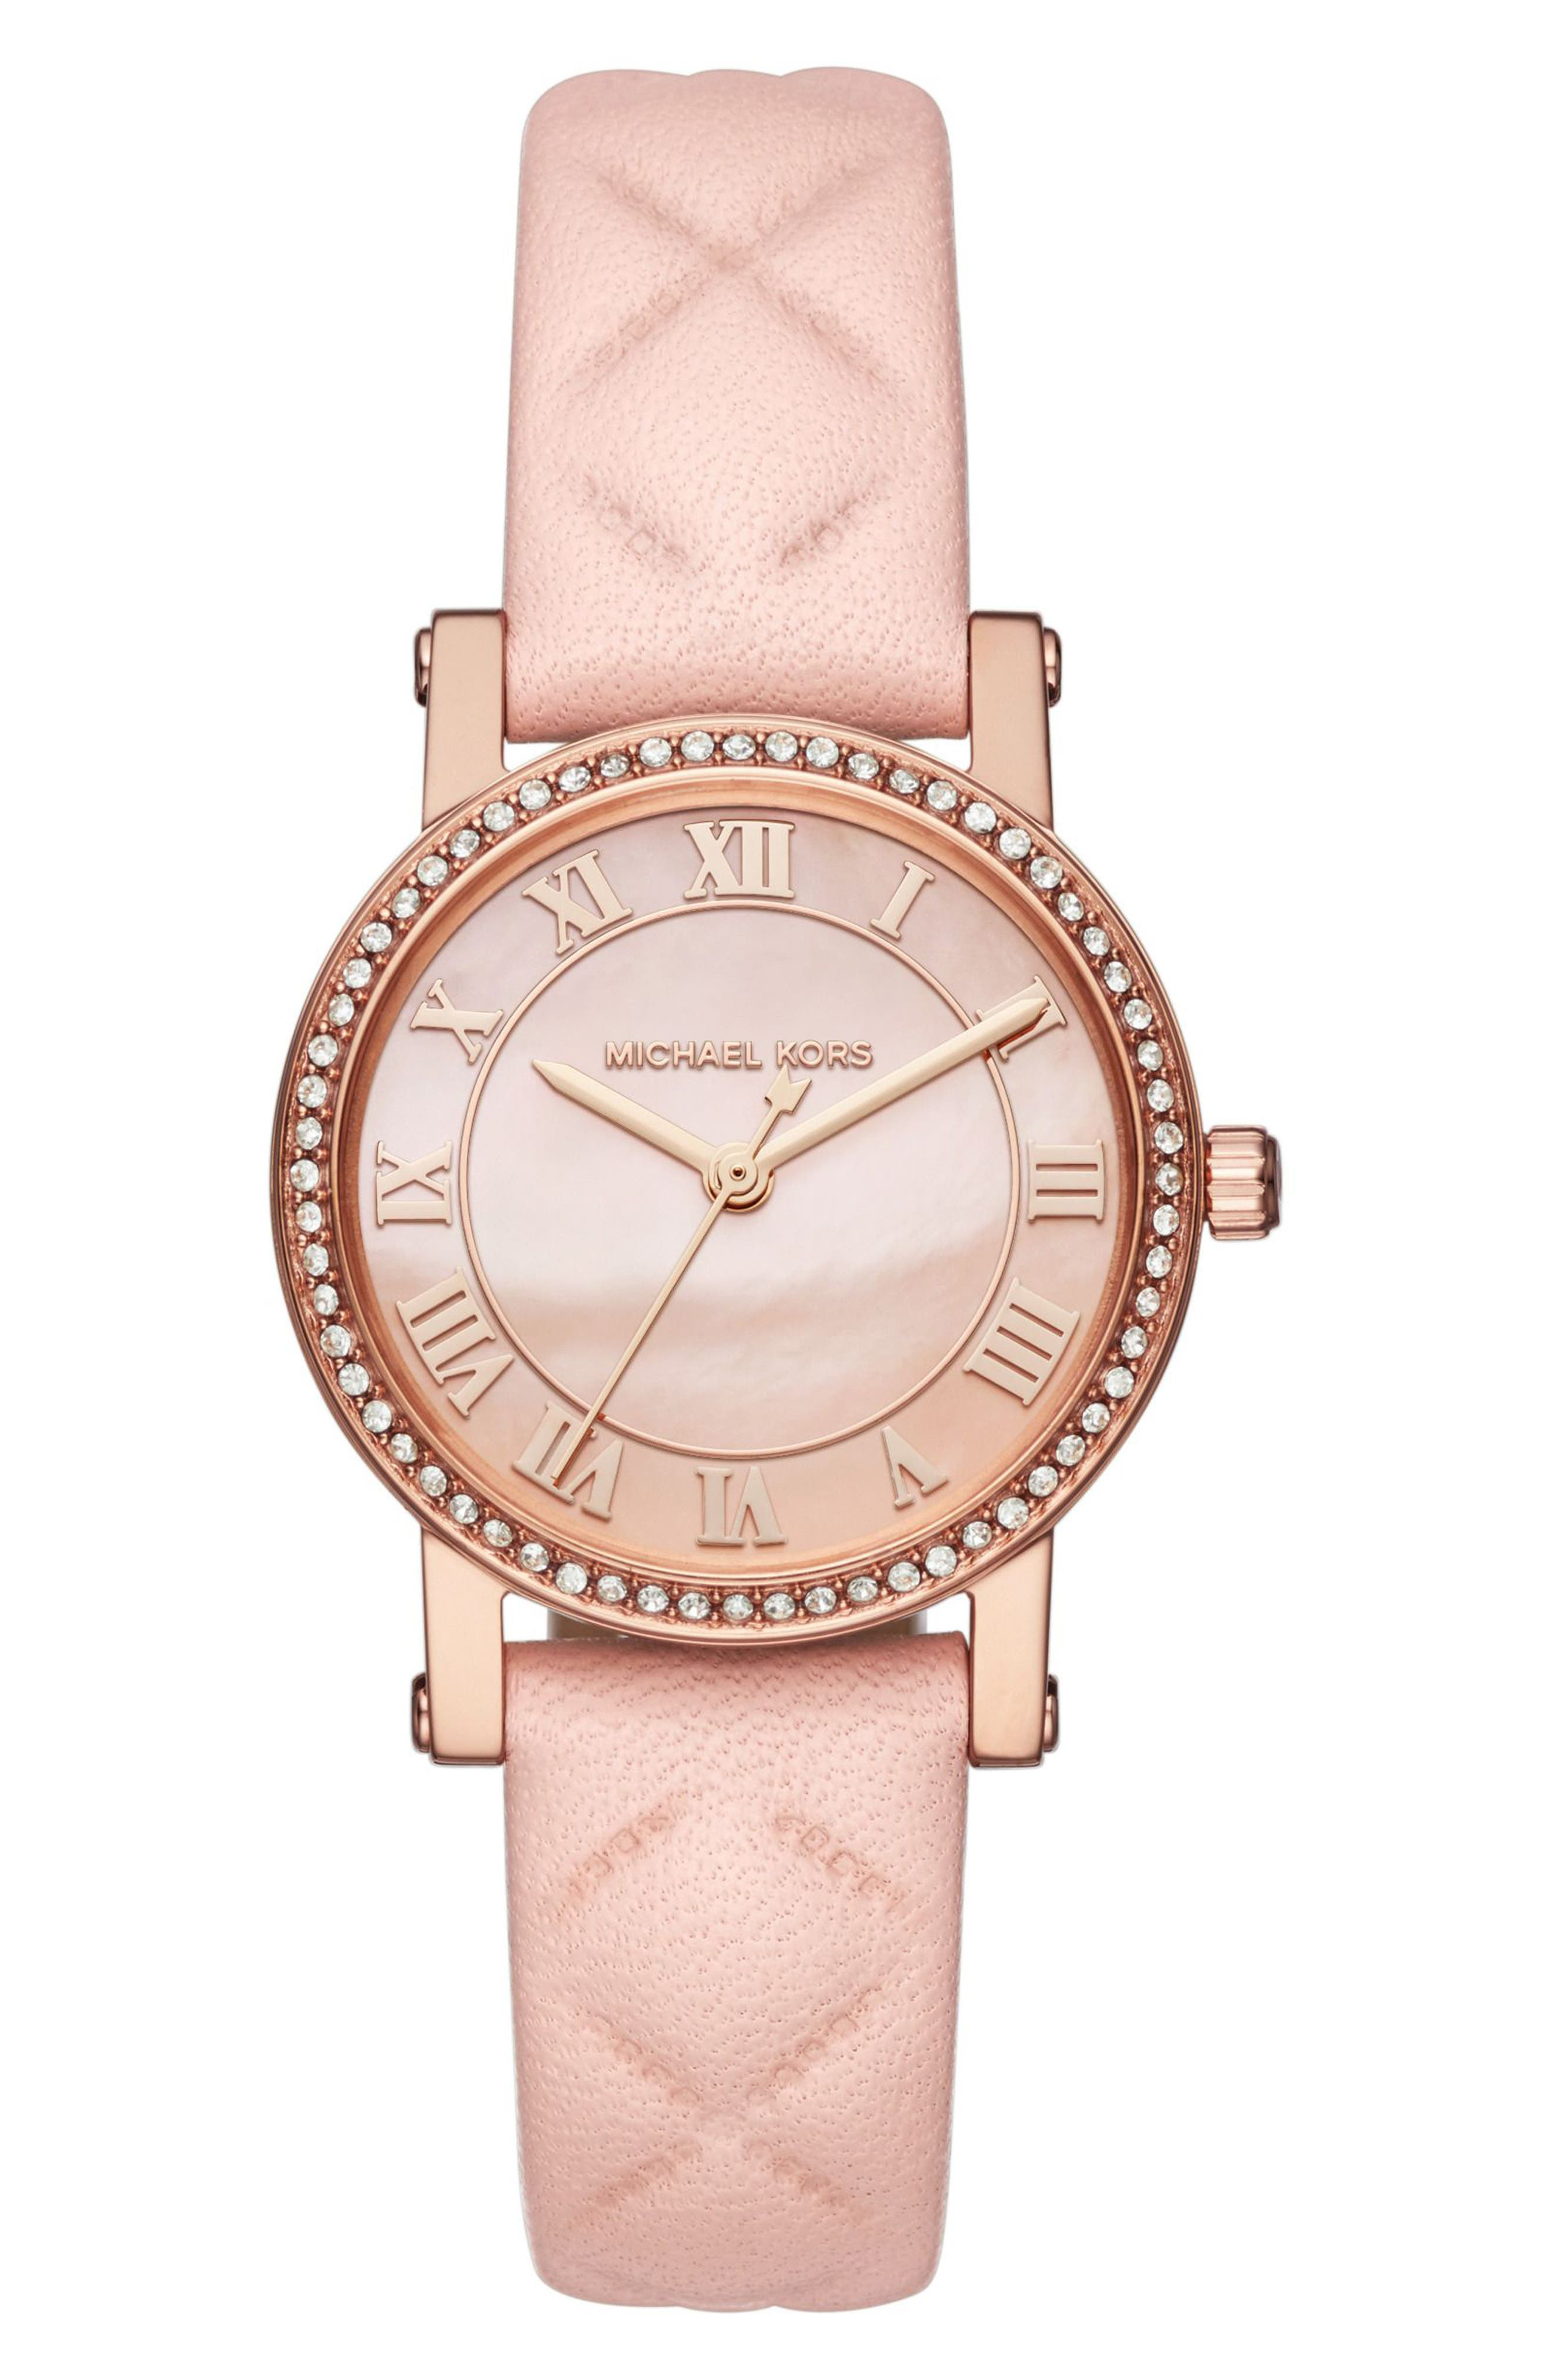 MICHAEL Michael Kors Petite Norie Crystal Accent Leather Strap Watch, 28mm,                             Main thumbnail 1, color,                             650